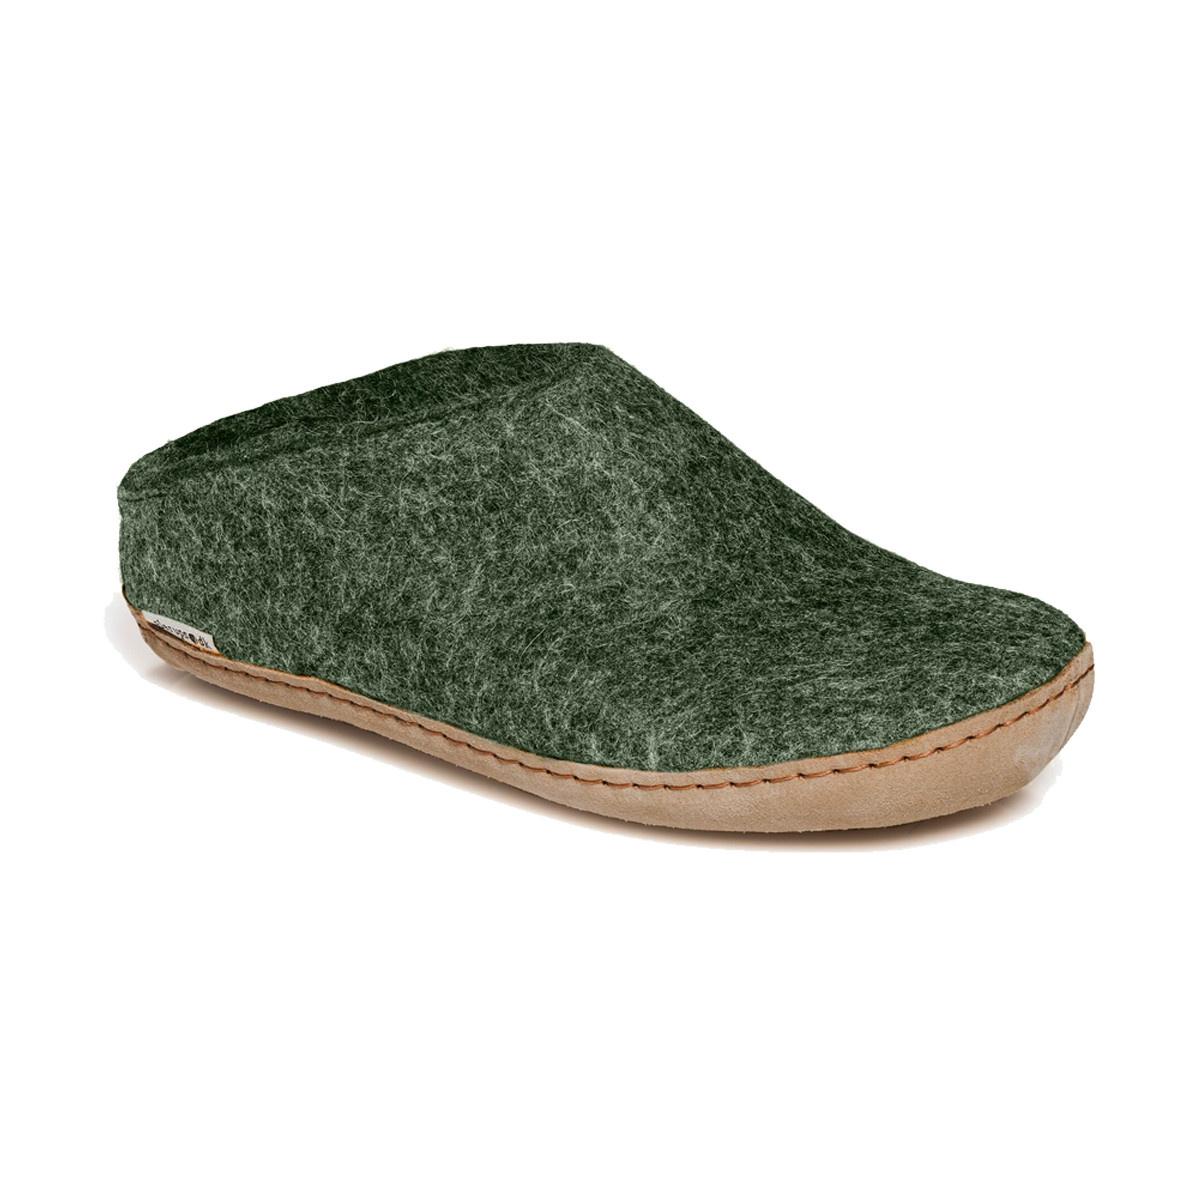 Glerups Glerups Women's Slipper Leather Sole Forest